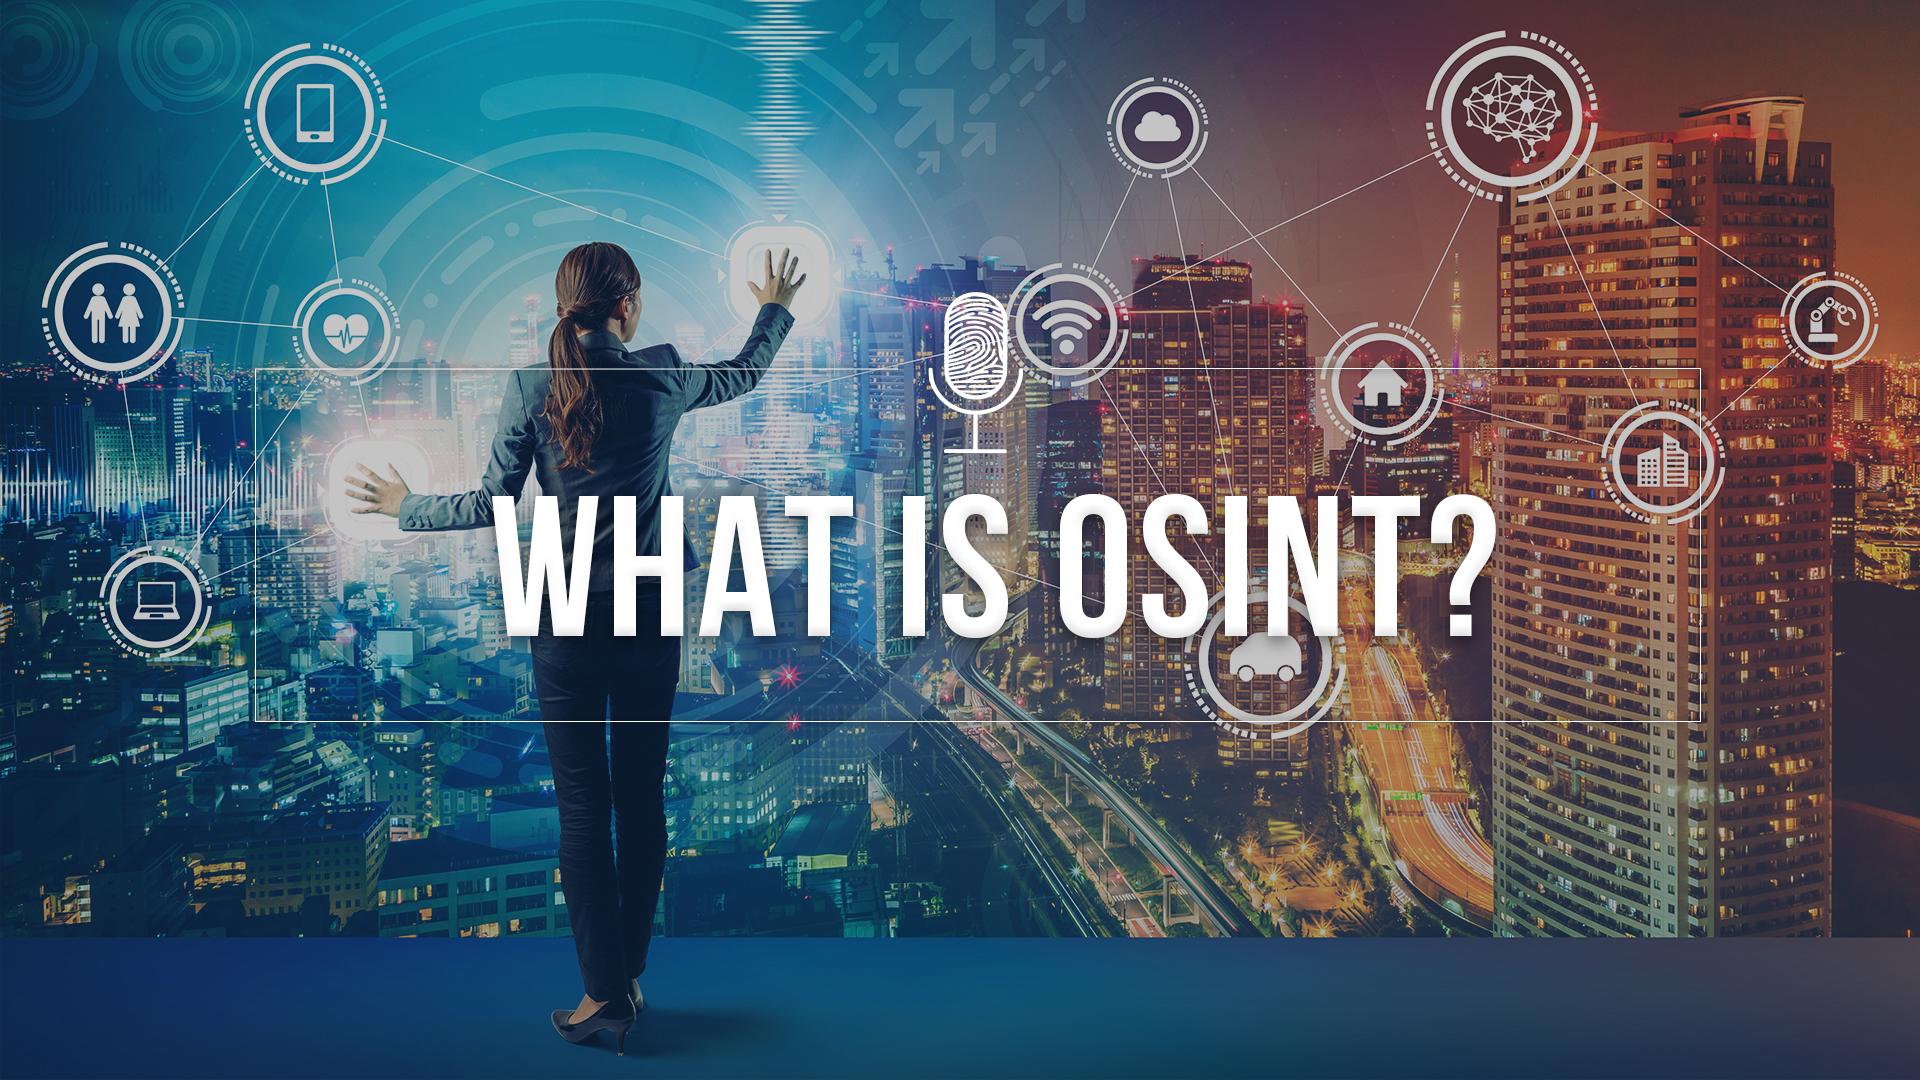 What is OSINT-thumb.jpg